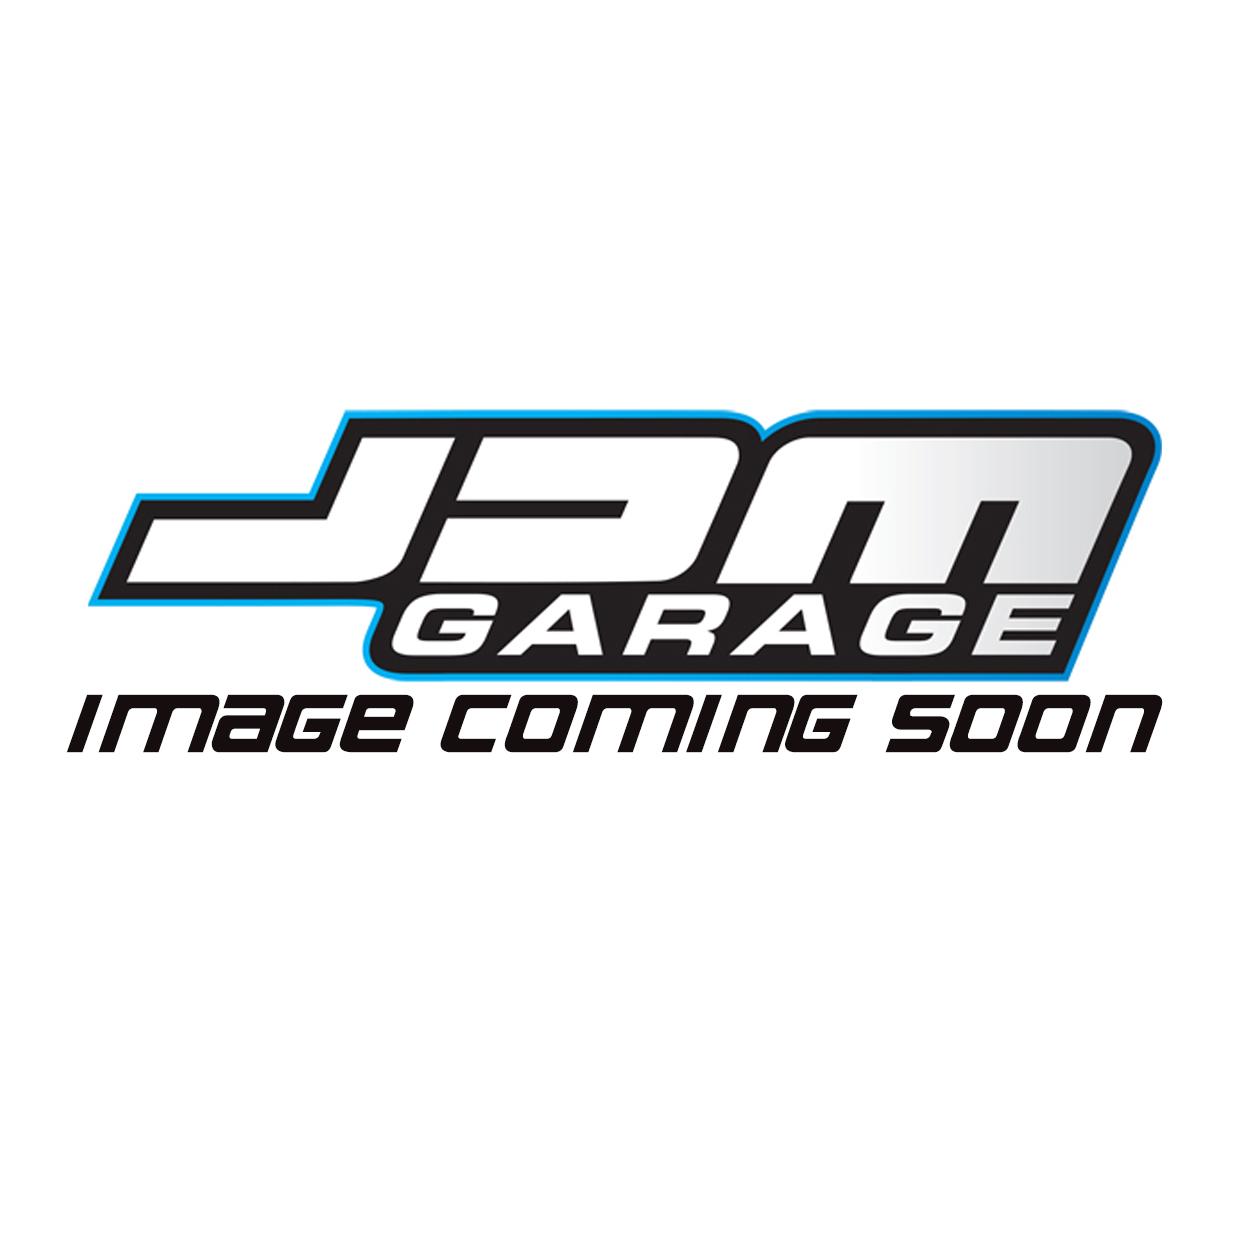 Mcleod Tuner Series Clutches Subaru Impreza STI 6 Speed